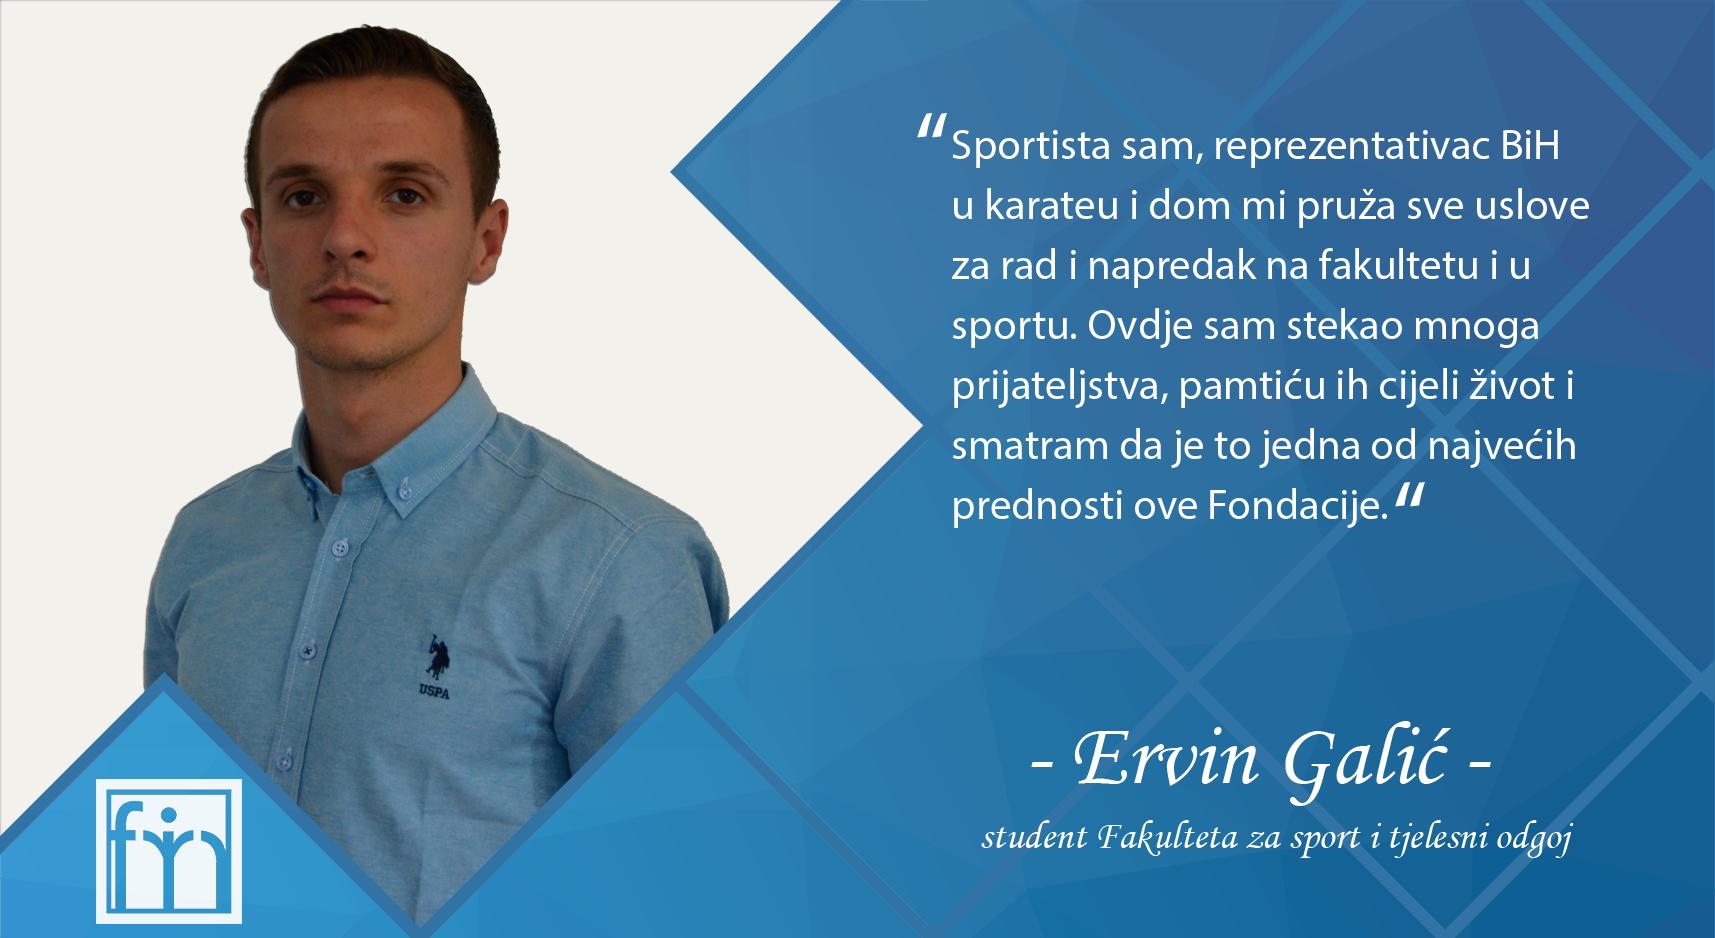 Ervin_Galic_Izvor_nade